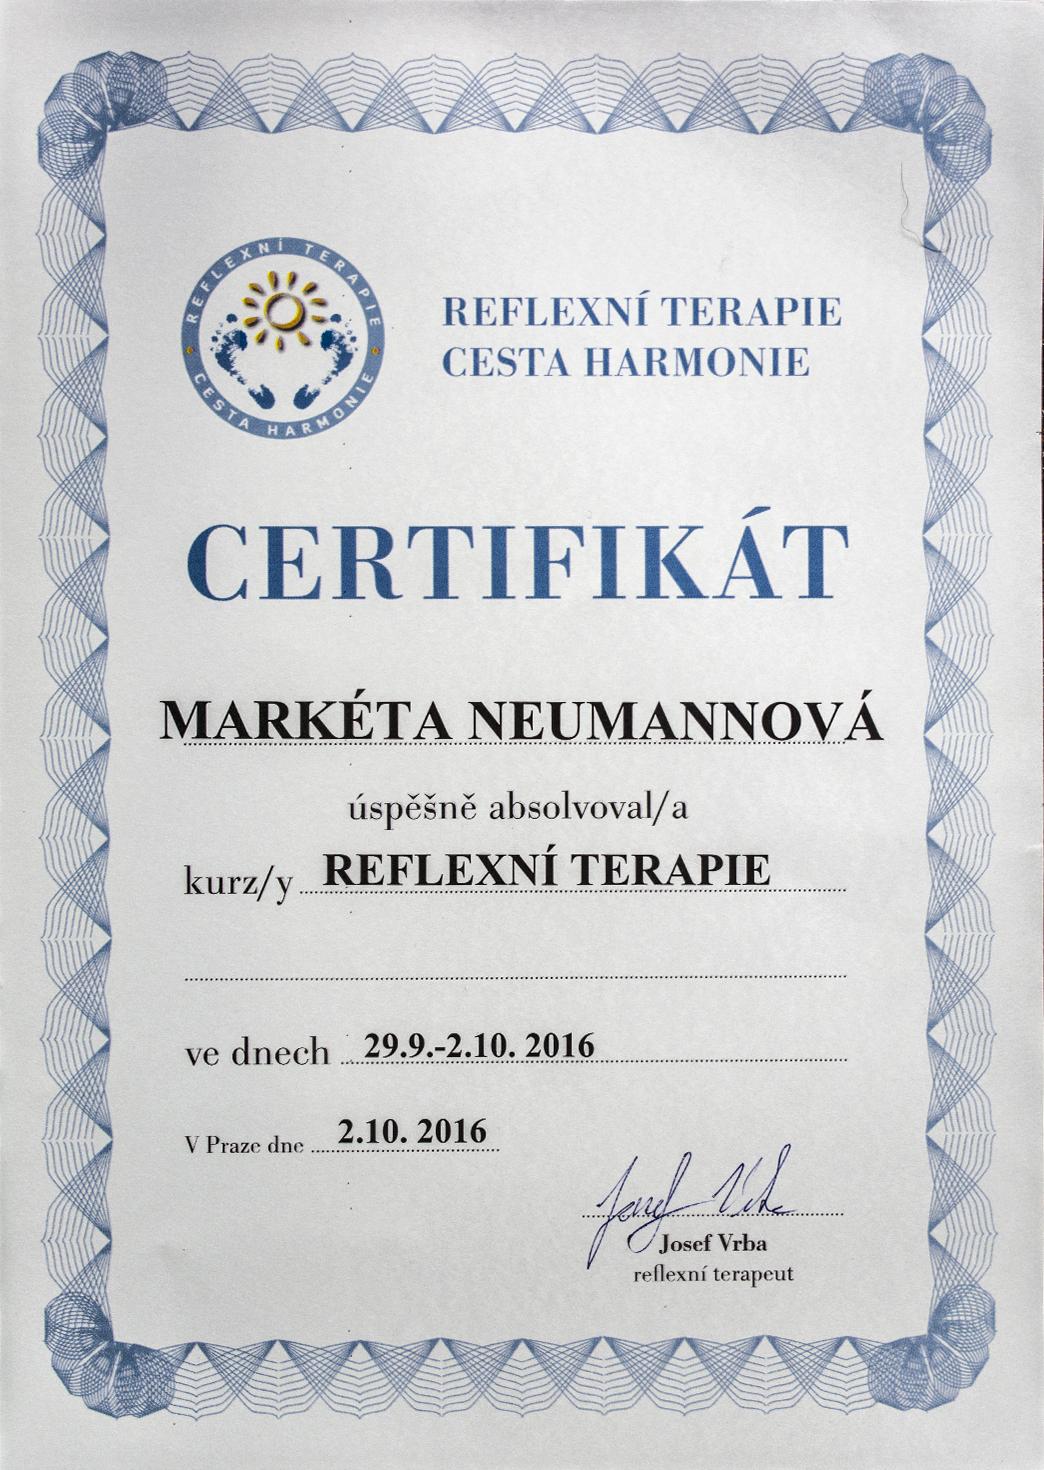 certifikaty-a-odbornosti-marketa-neumannovalecitelka-terapeutkamasazebiorezonancedetoxikacefrekvencni-terapie-benatky-nad-jizeroureflexni-terapie